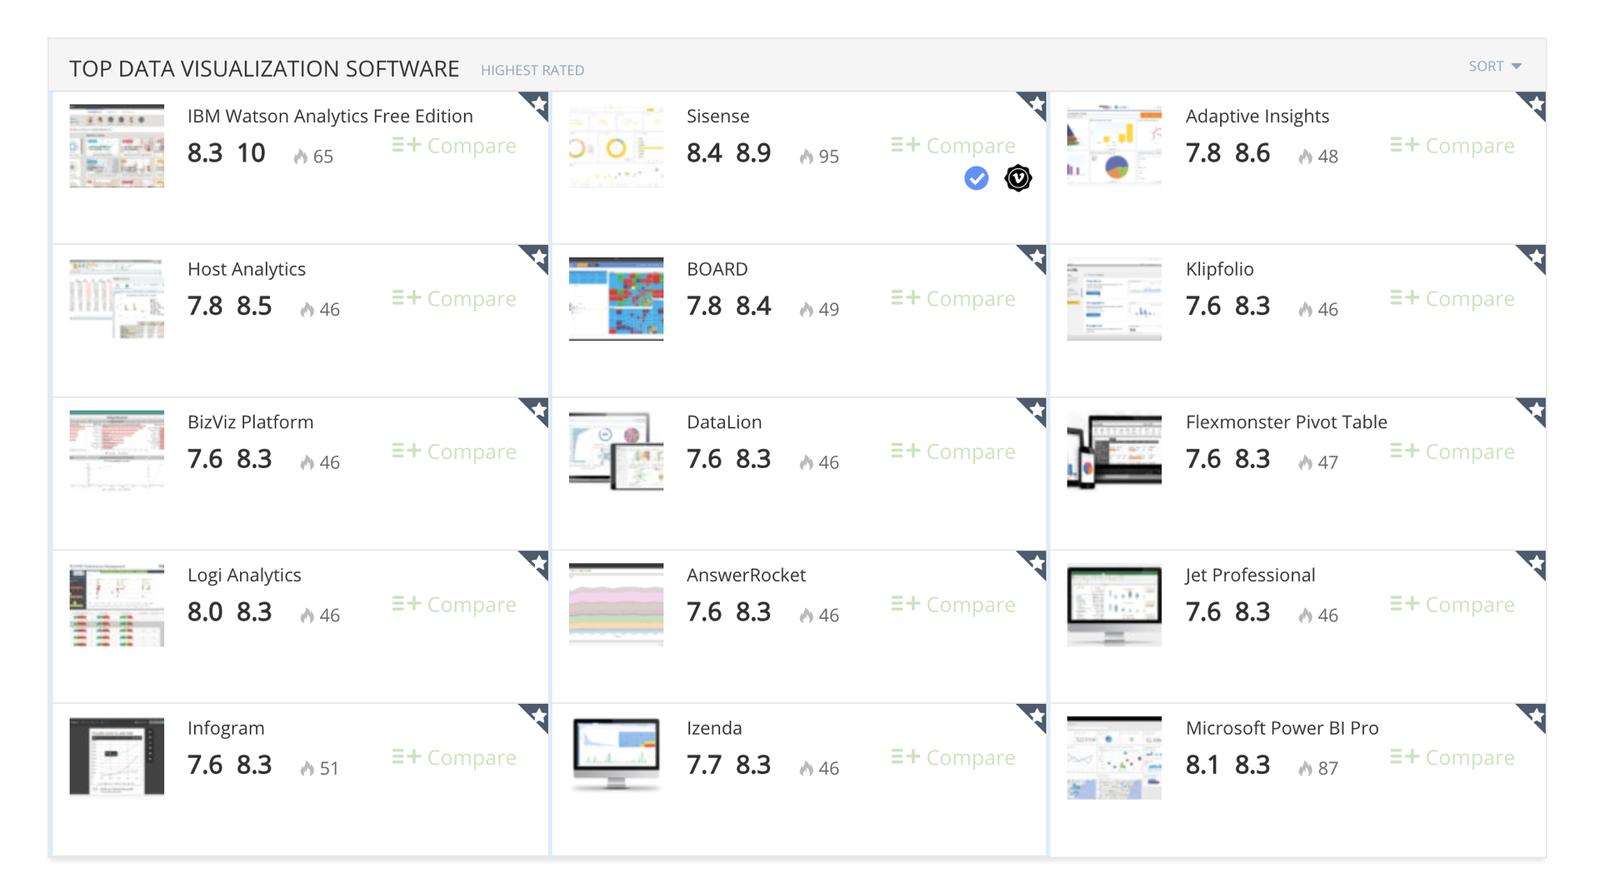 Top data visualization software